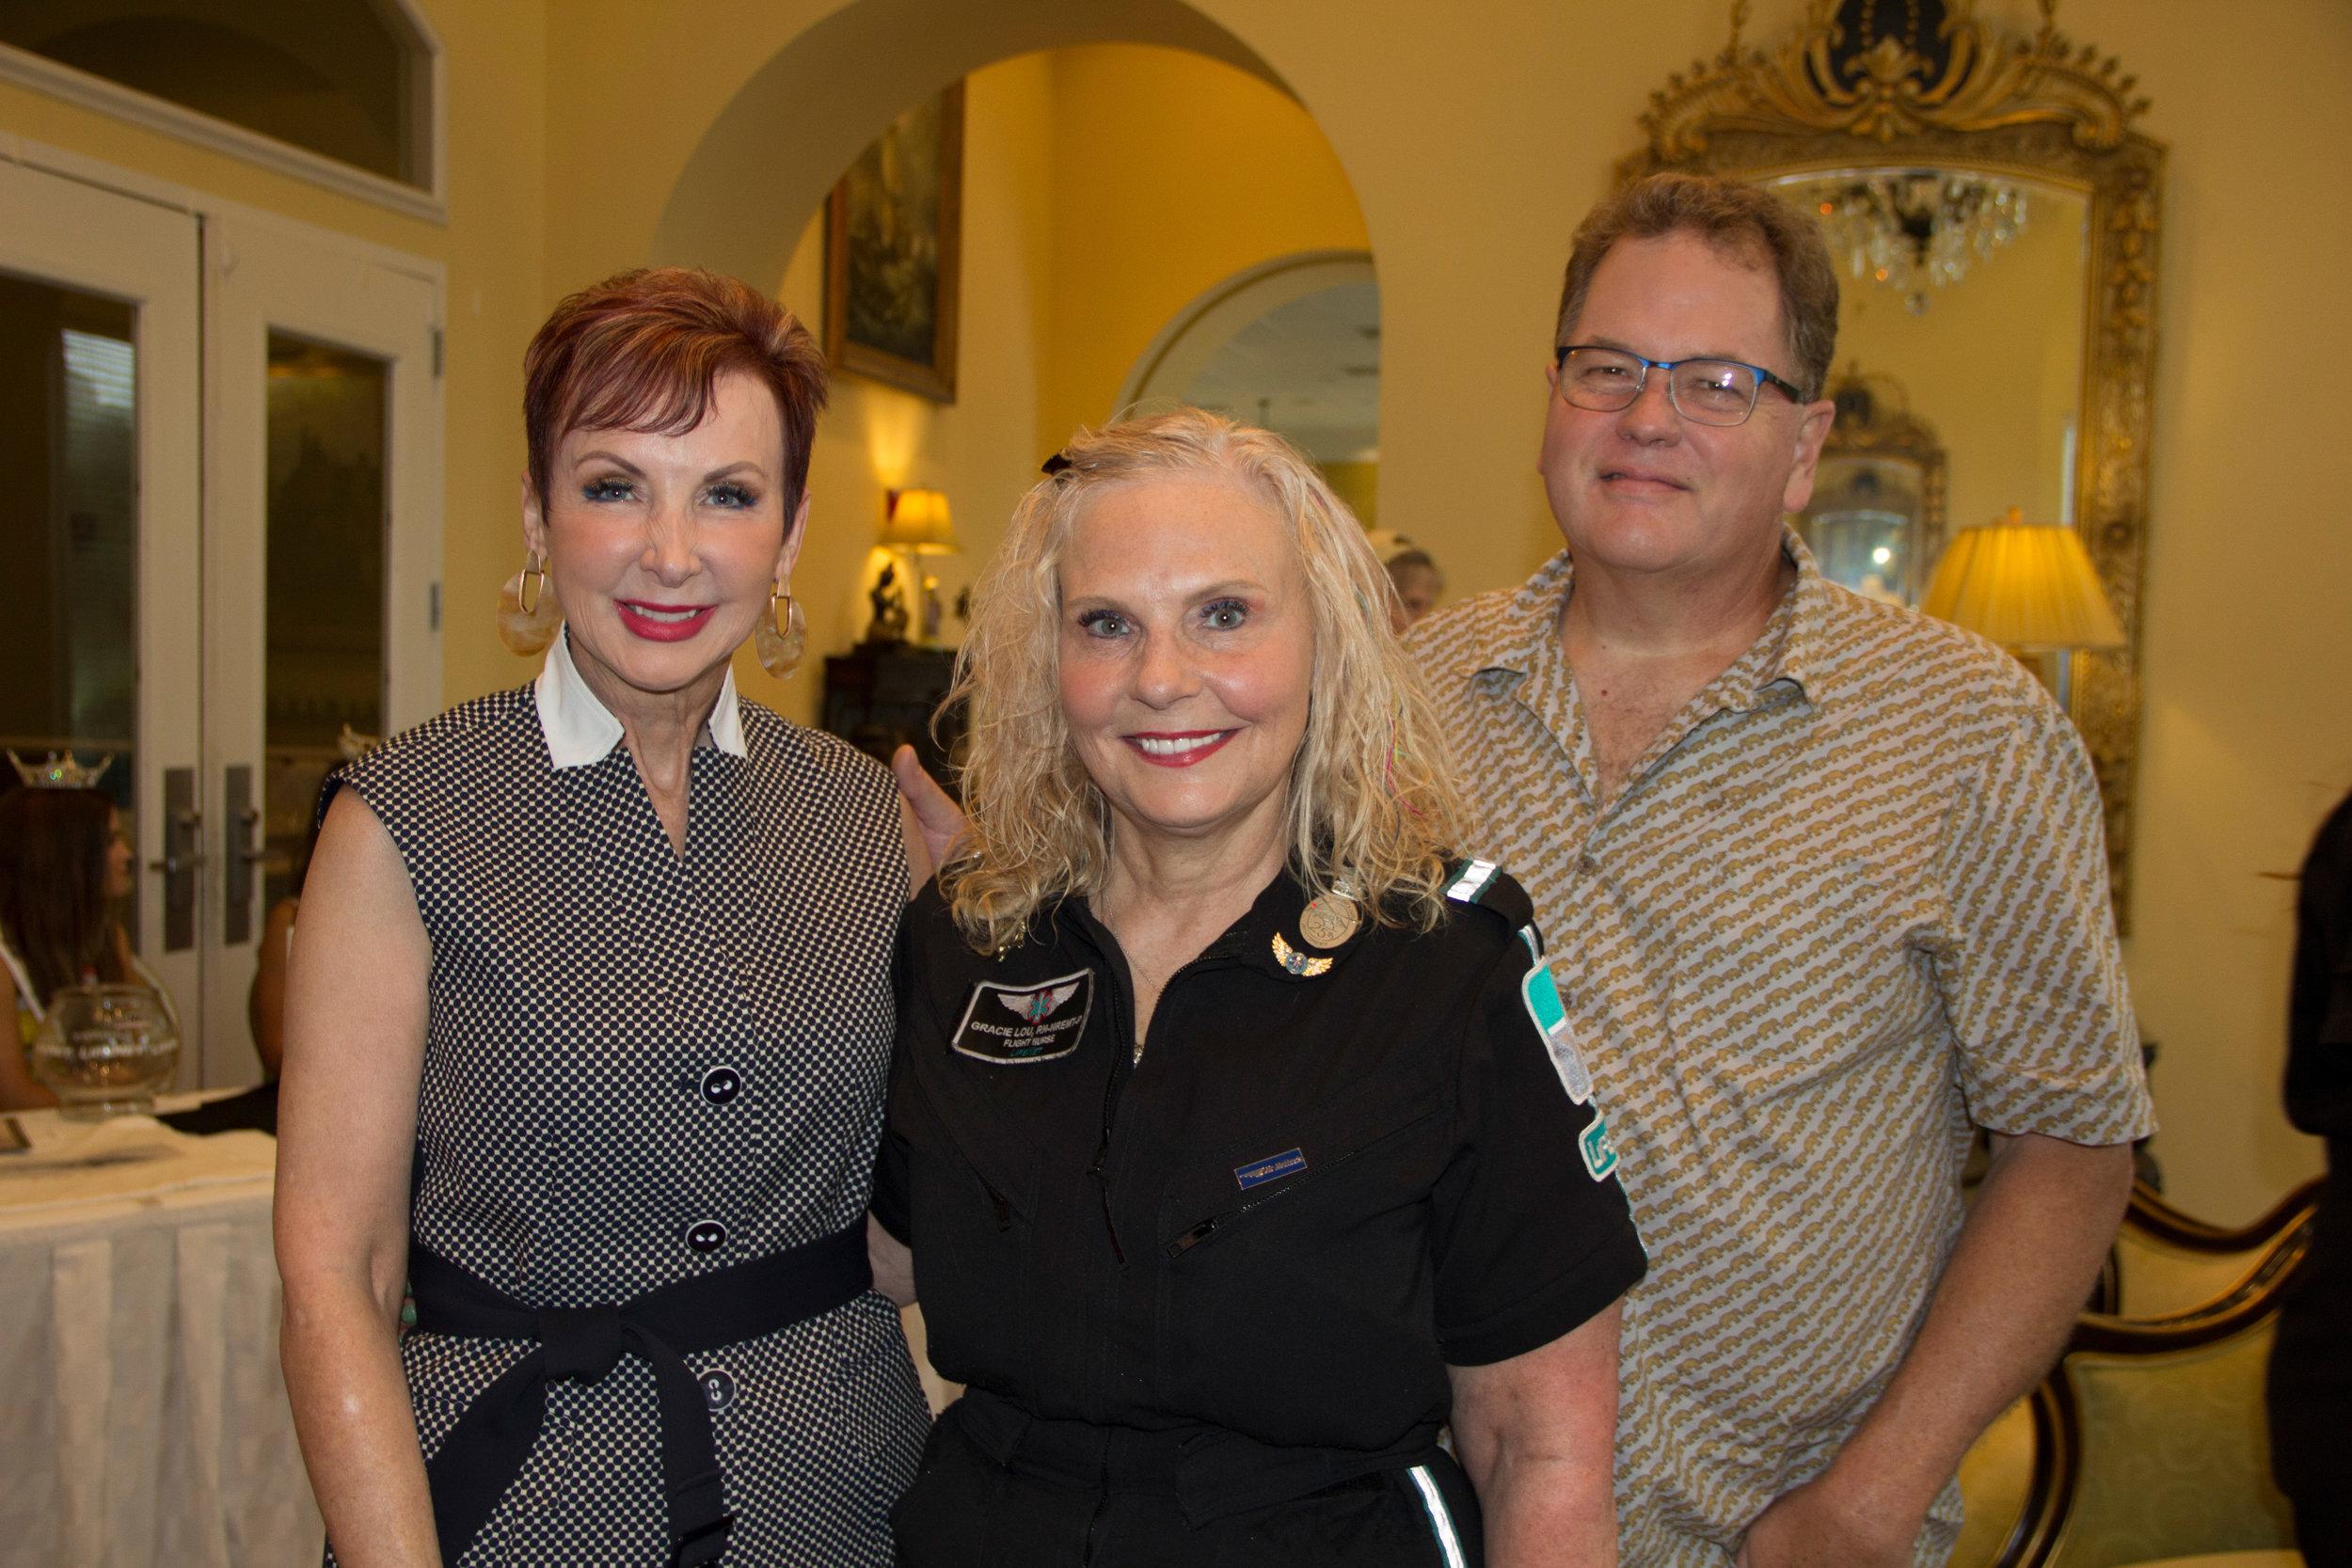 Lenna O'Dell, Gracie Lou Murphy and Craig Knapp